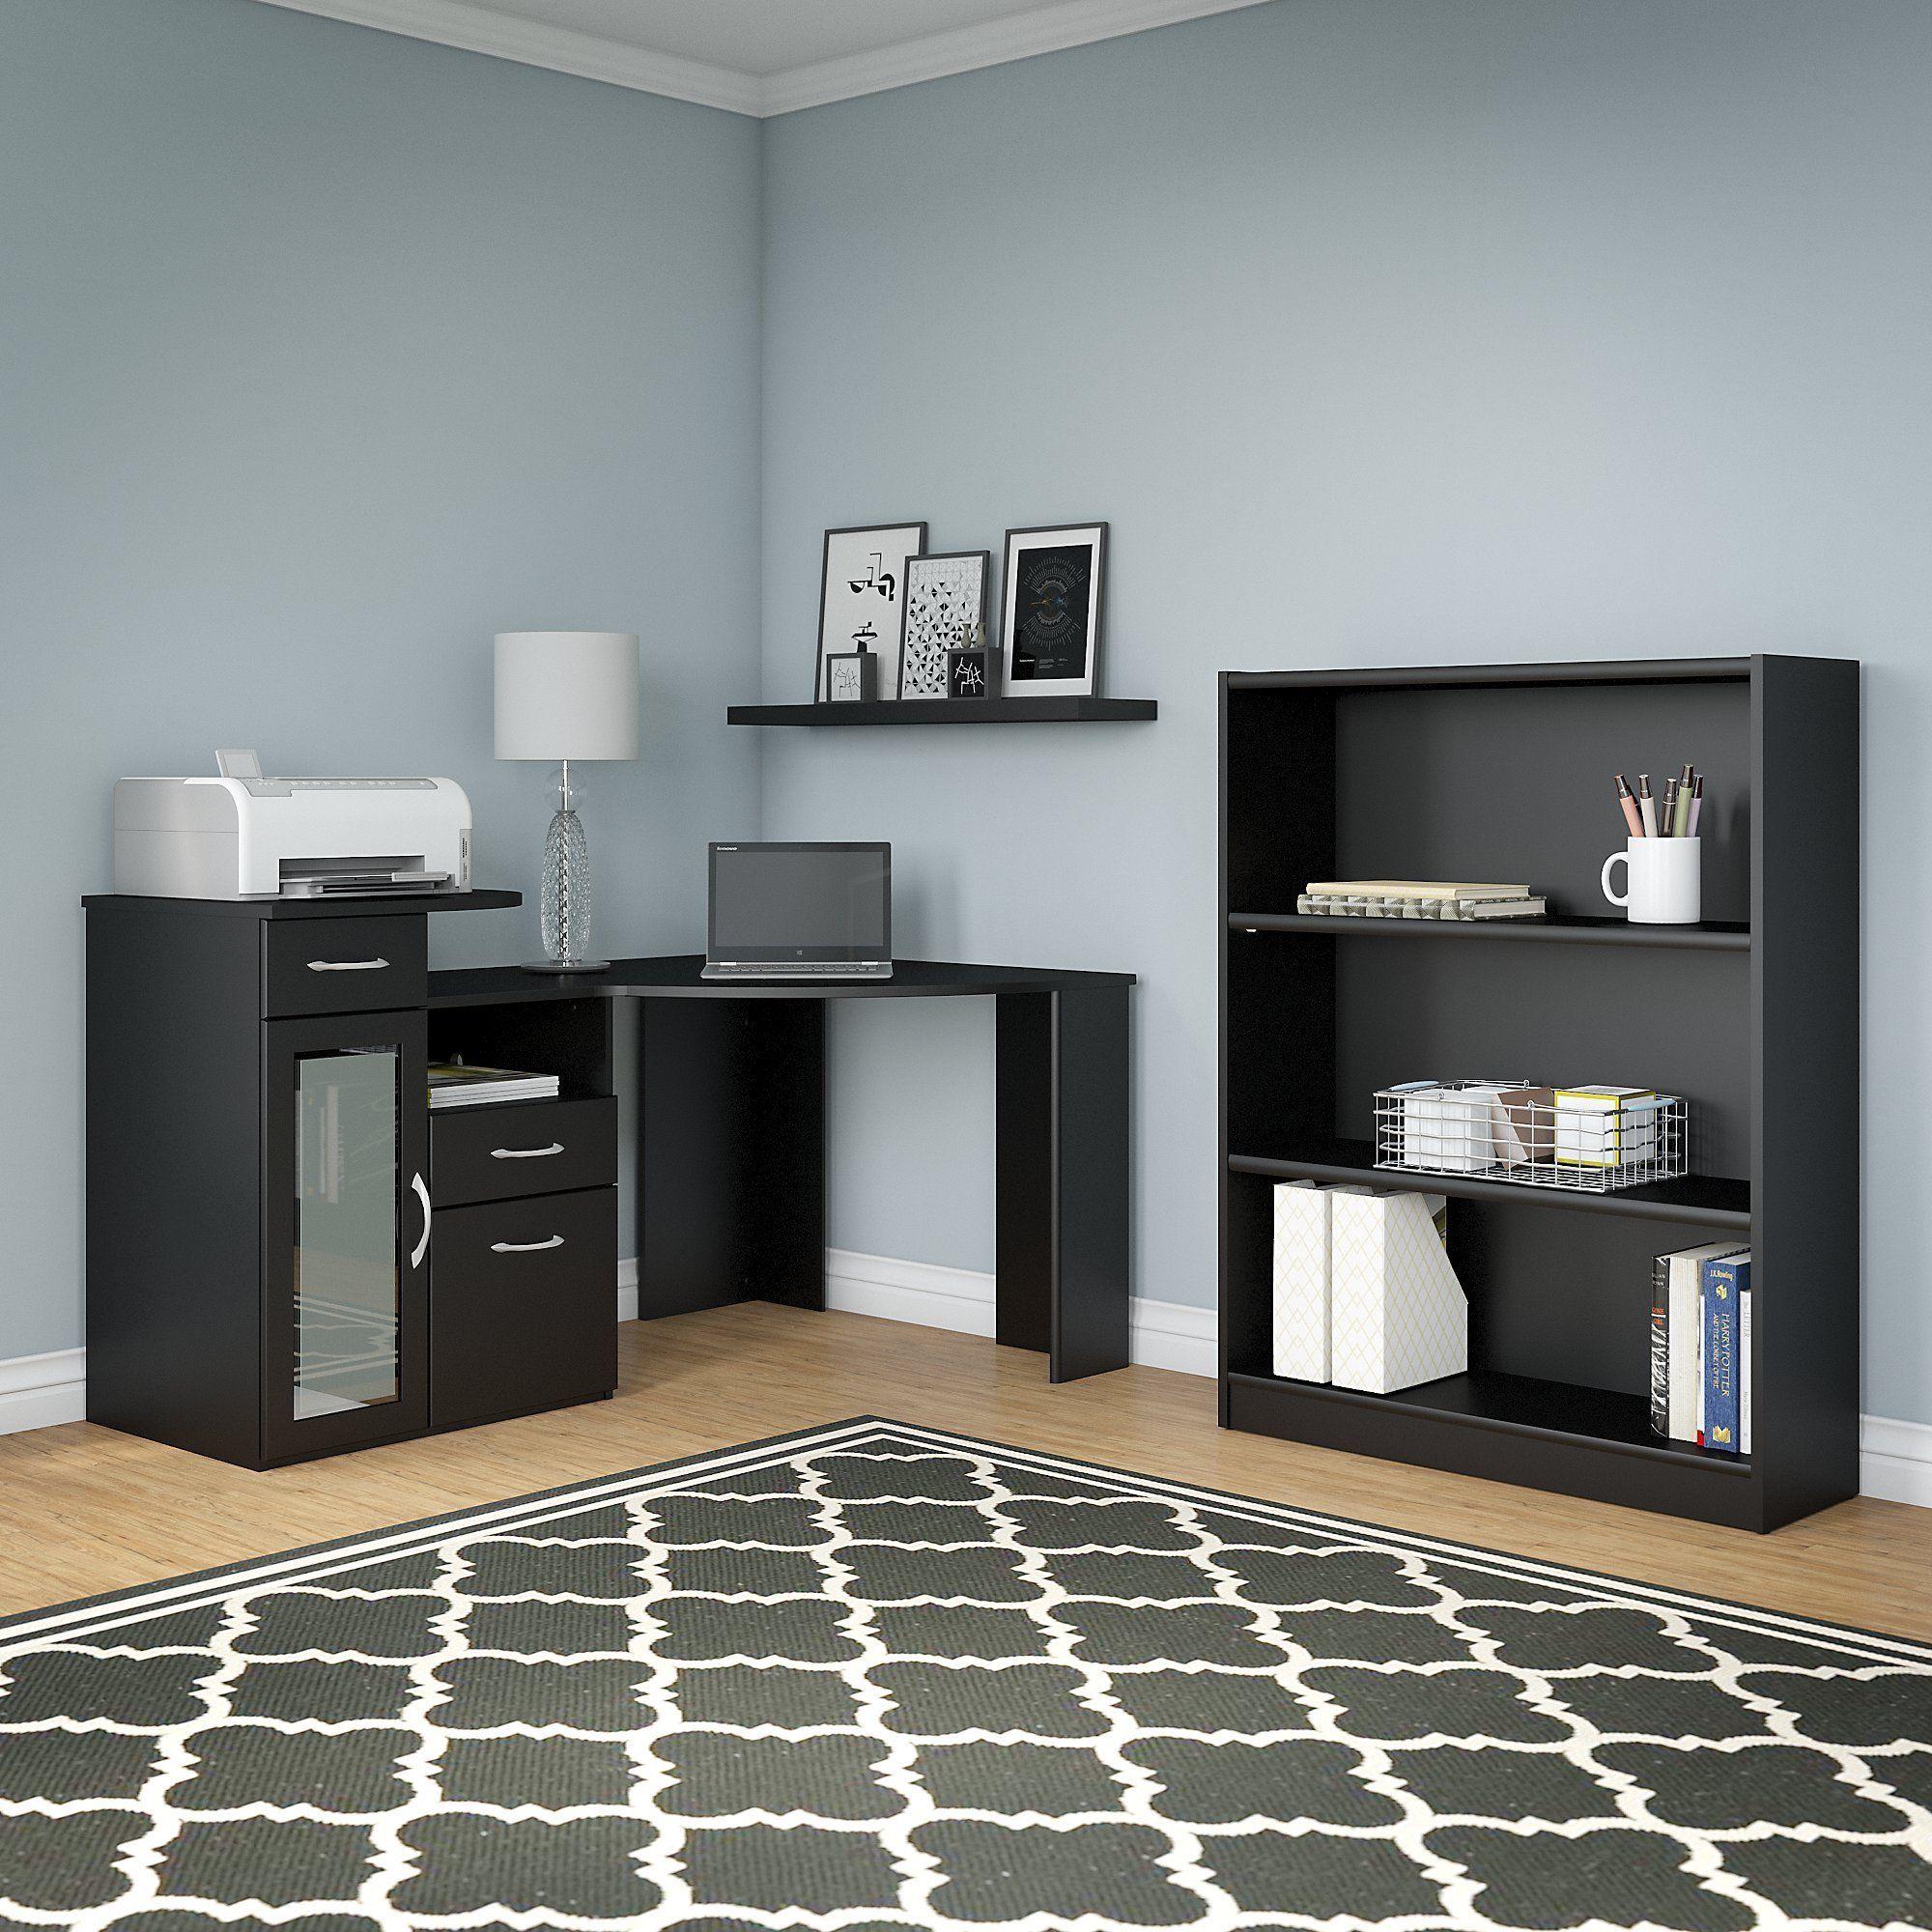 Bush Furniture Vantage Clic Black Corner Desk And Bookcase Set With 3 Shelf